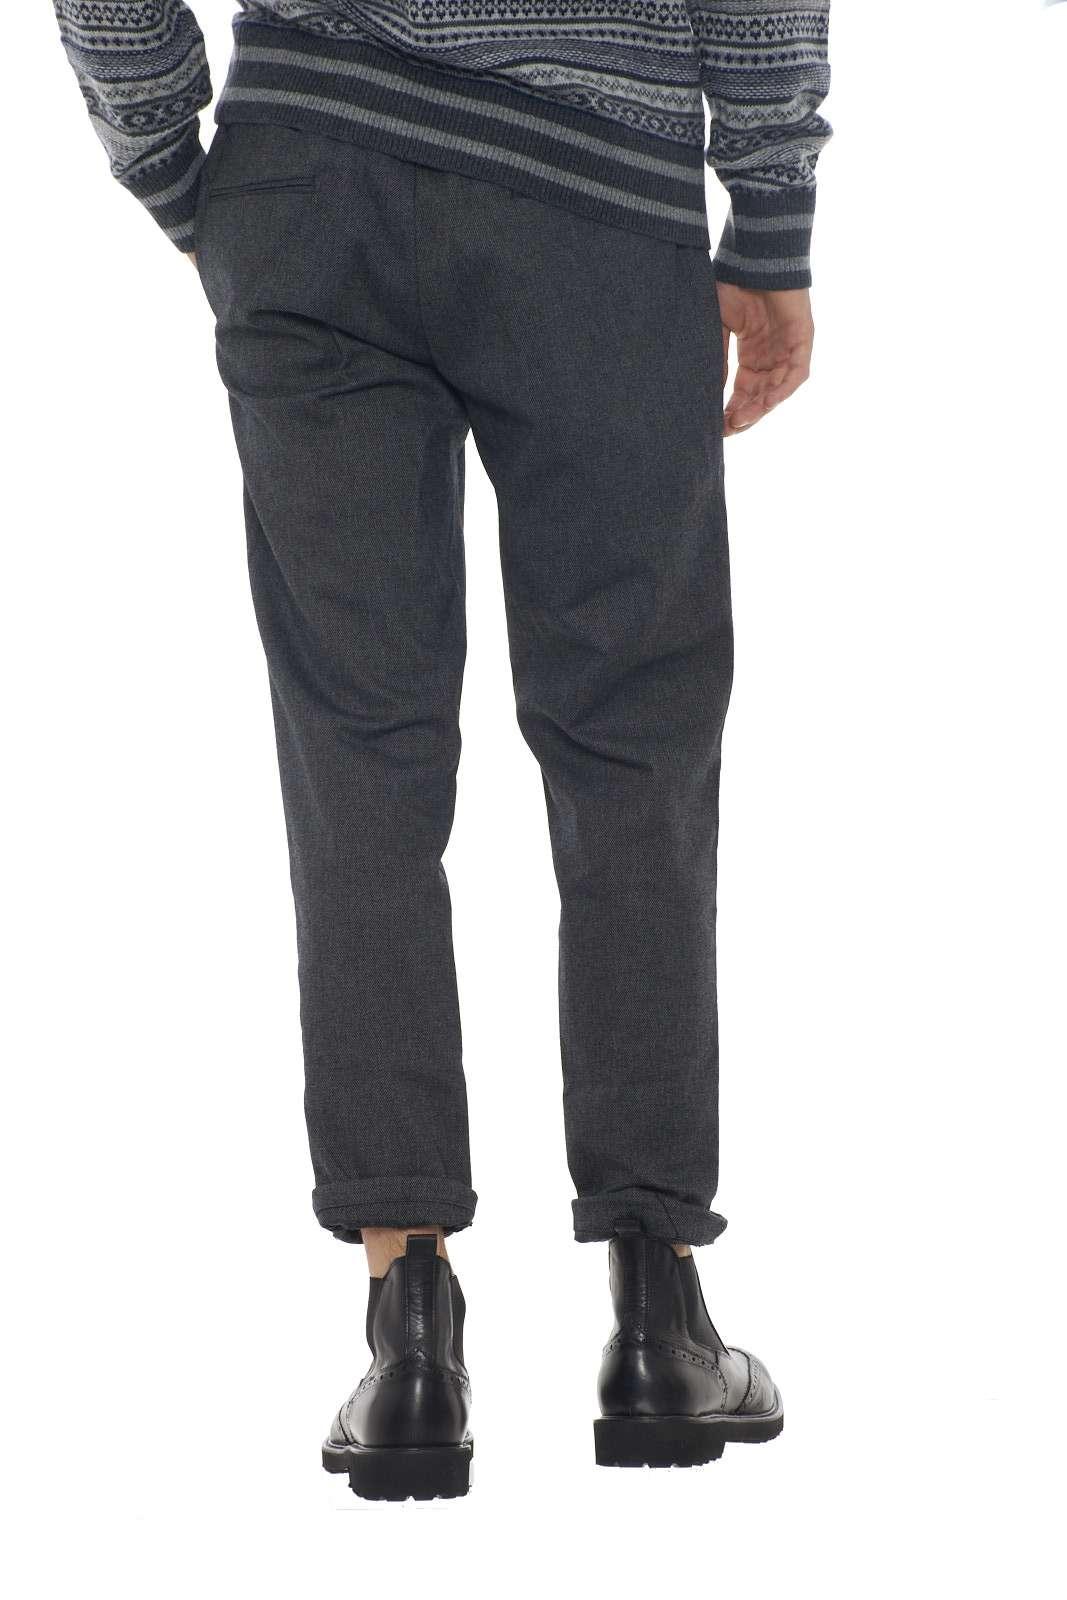 https://www.parmax.com/media/catalog/product/a/i/AI-outlet_parmax-pantaloni-uomo-Micheal%20Coal-johnny3298-D.jpg